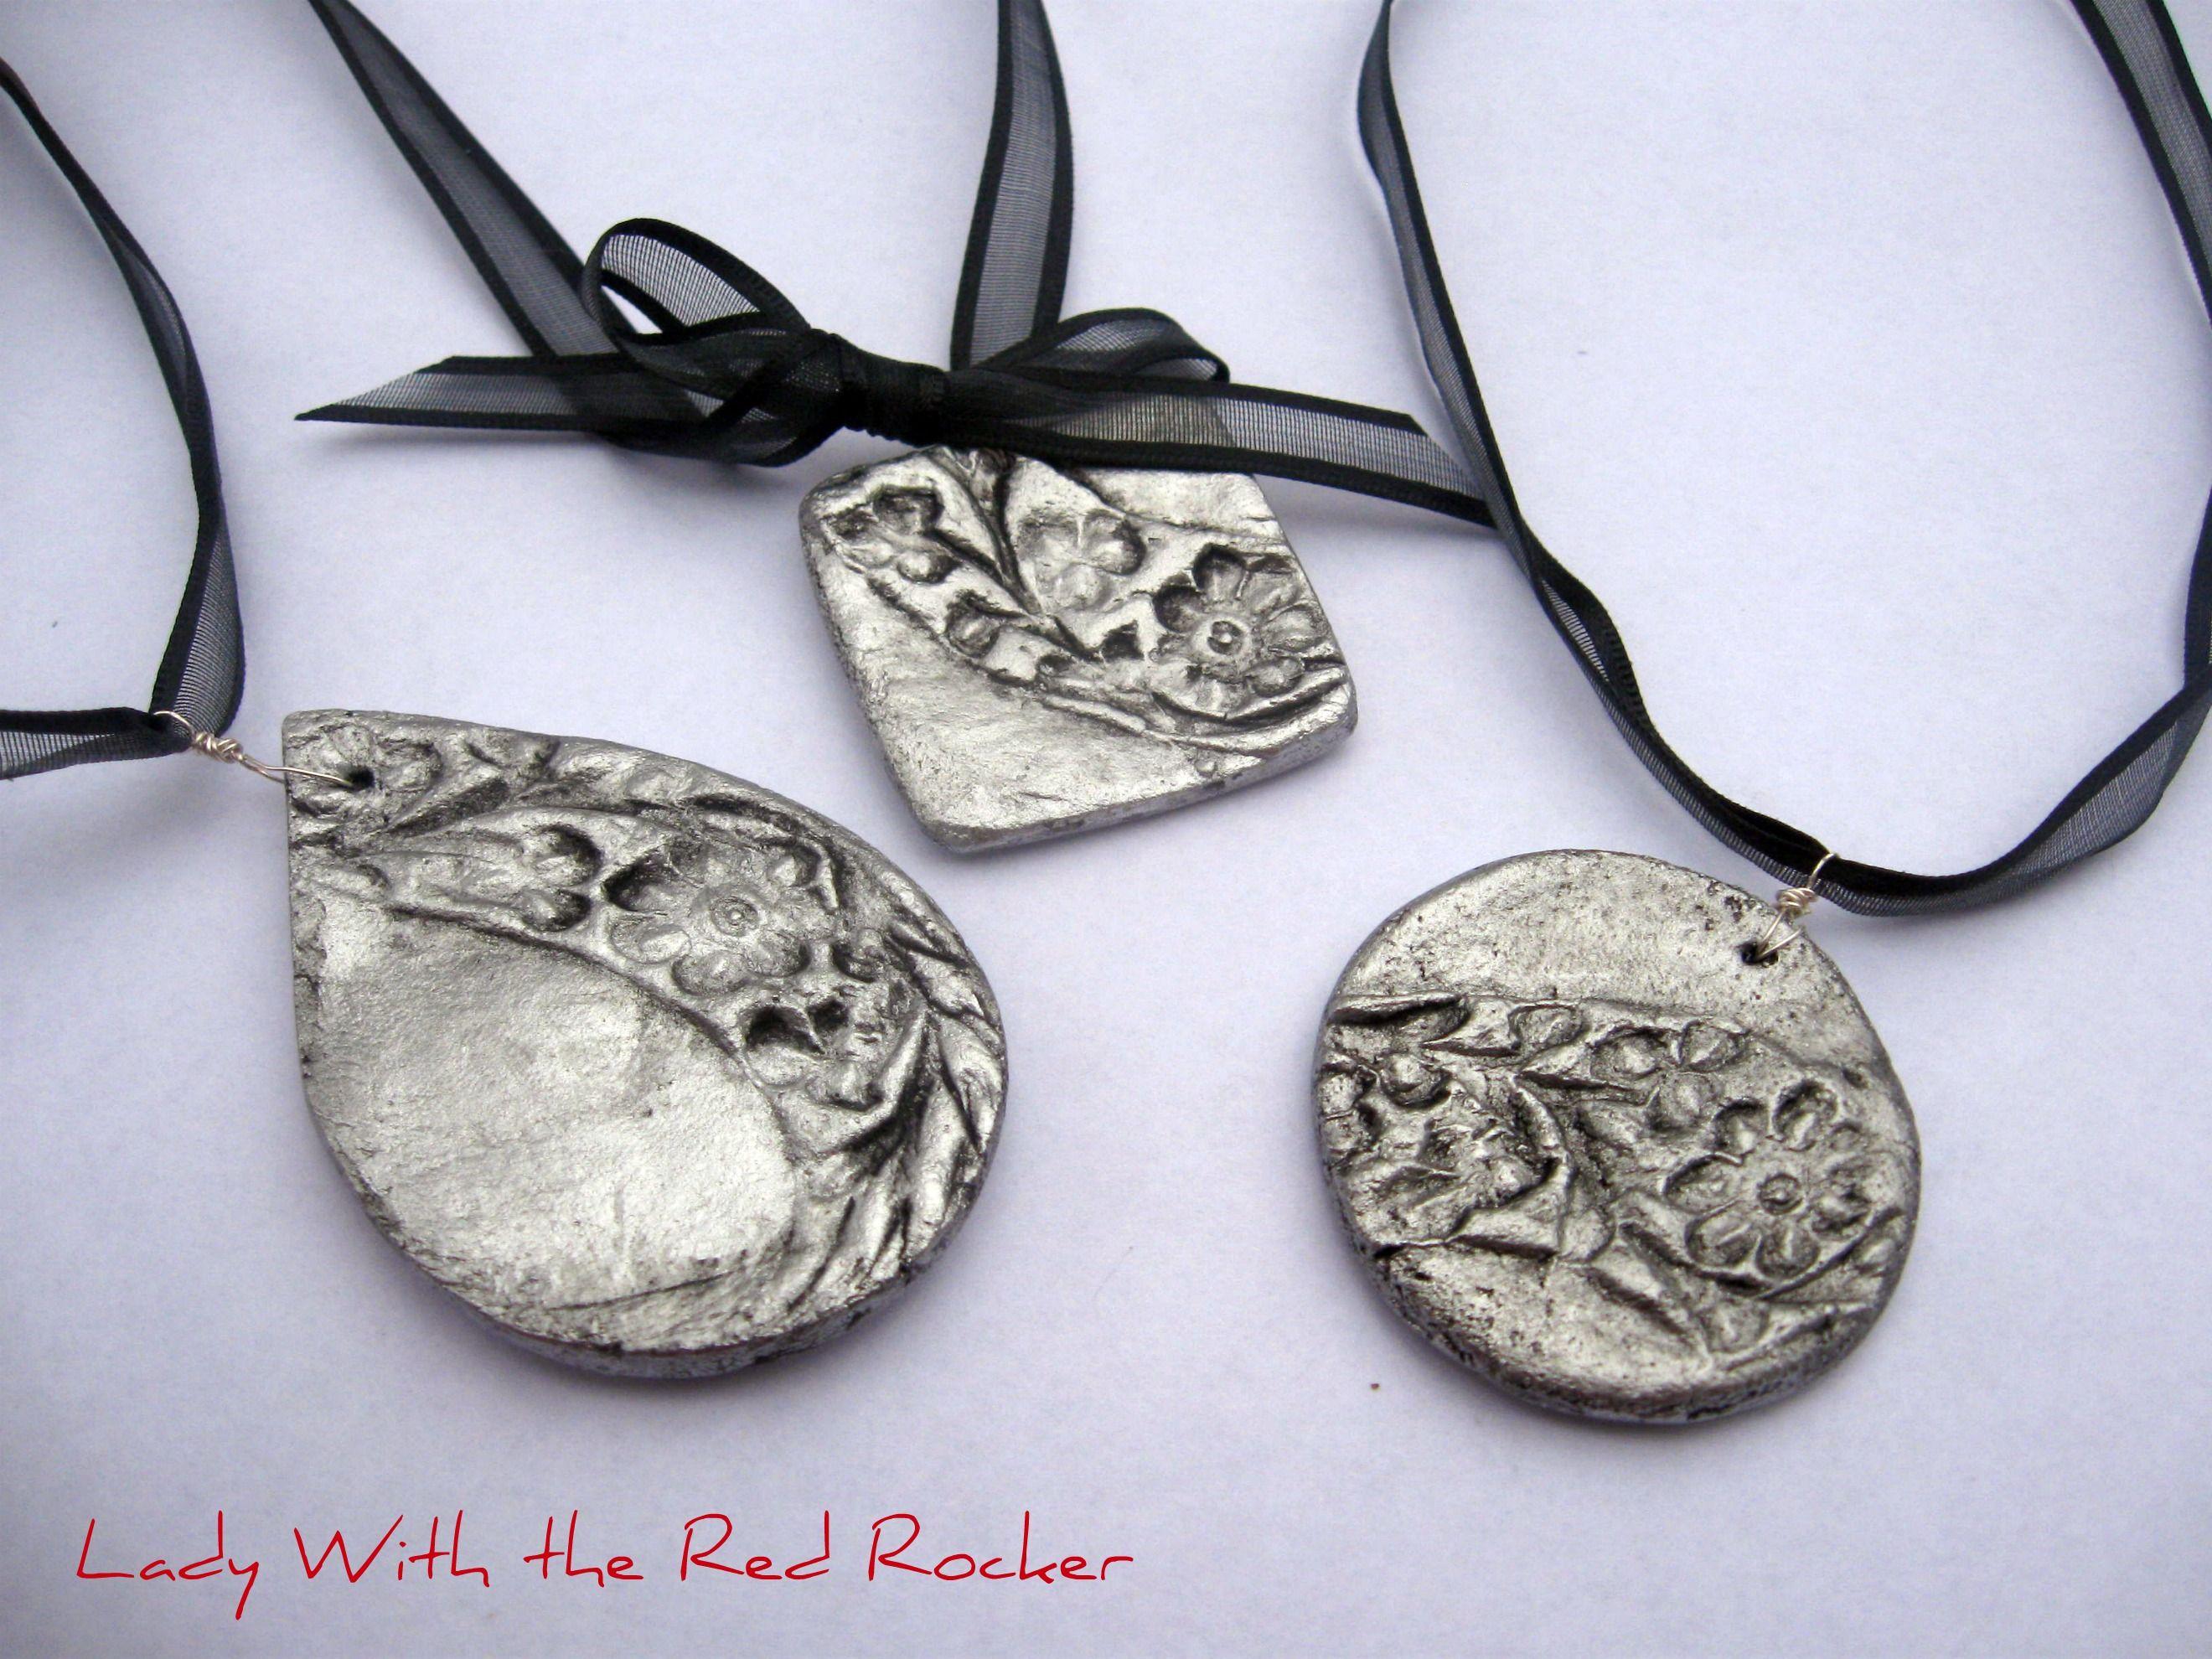 Handcrafted pendants play dough salt dough and metallic handcrafted pendants aloadofball Choice Image